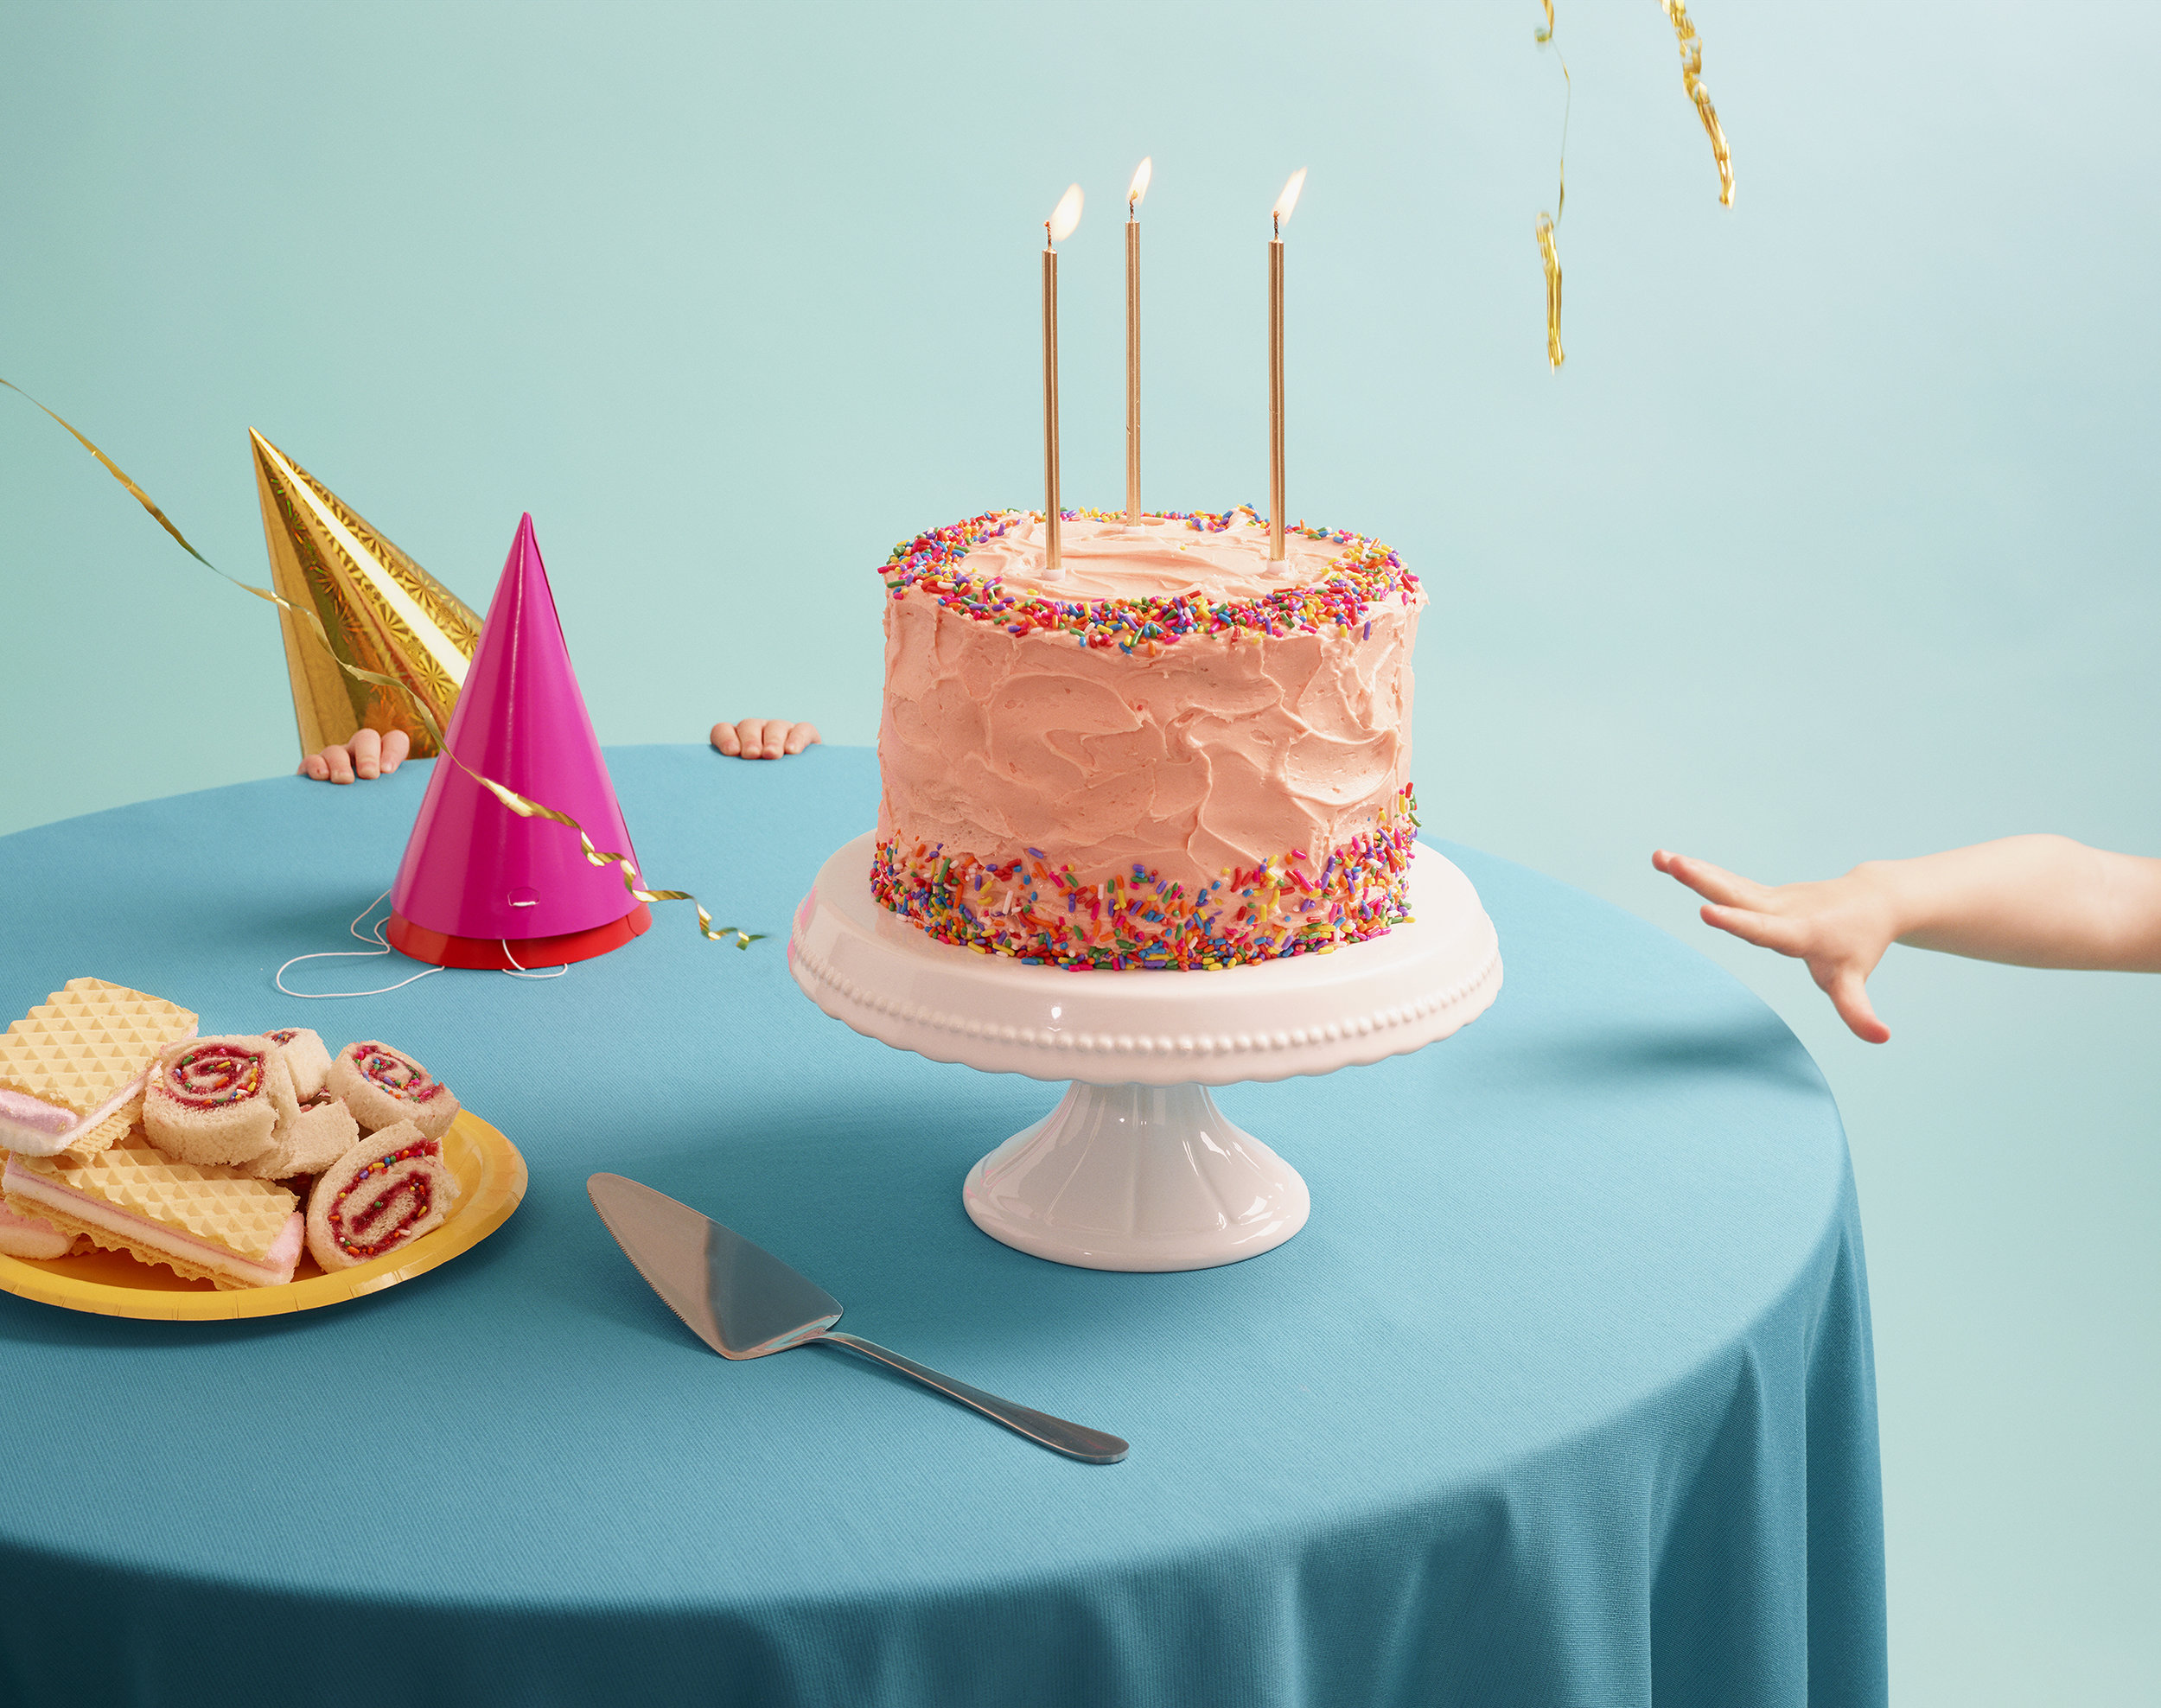 VL886_BirthdayParty_cake_before.jpg